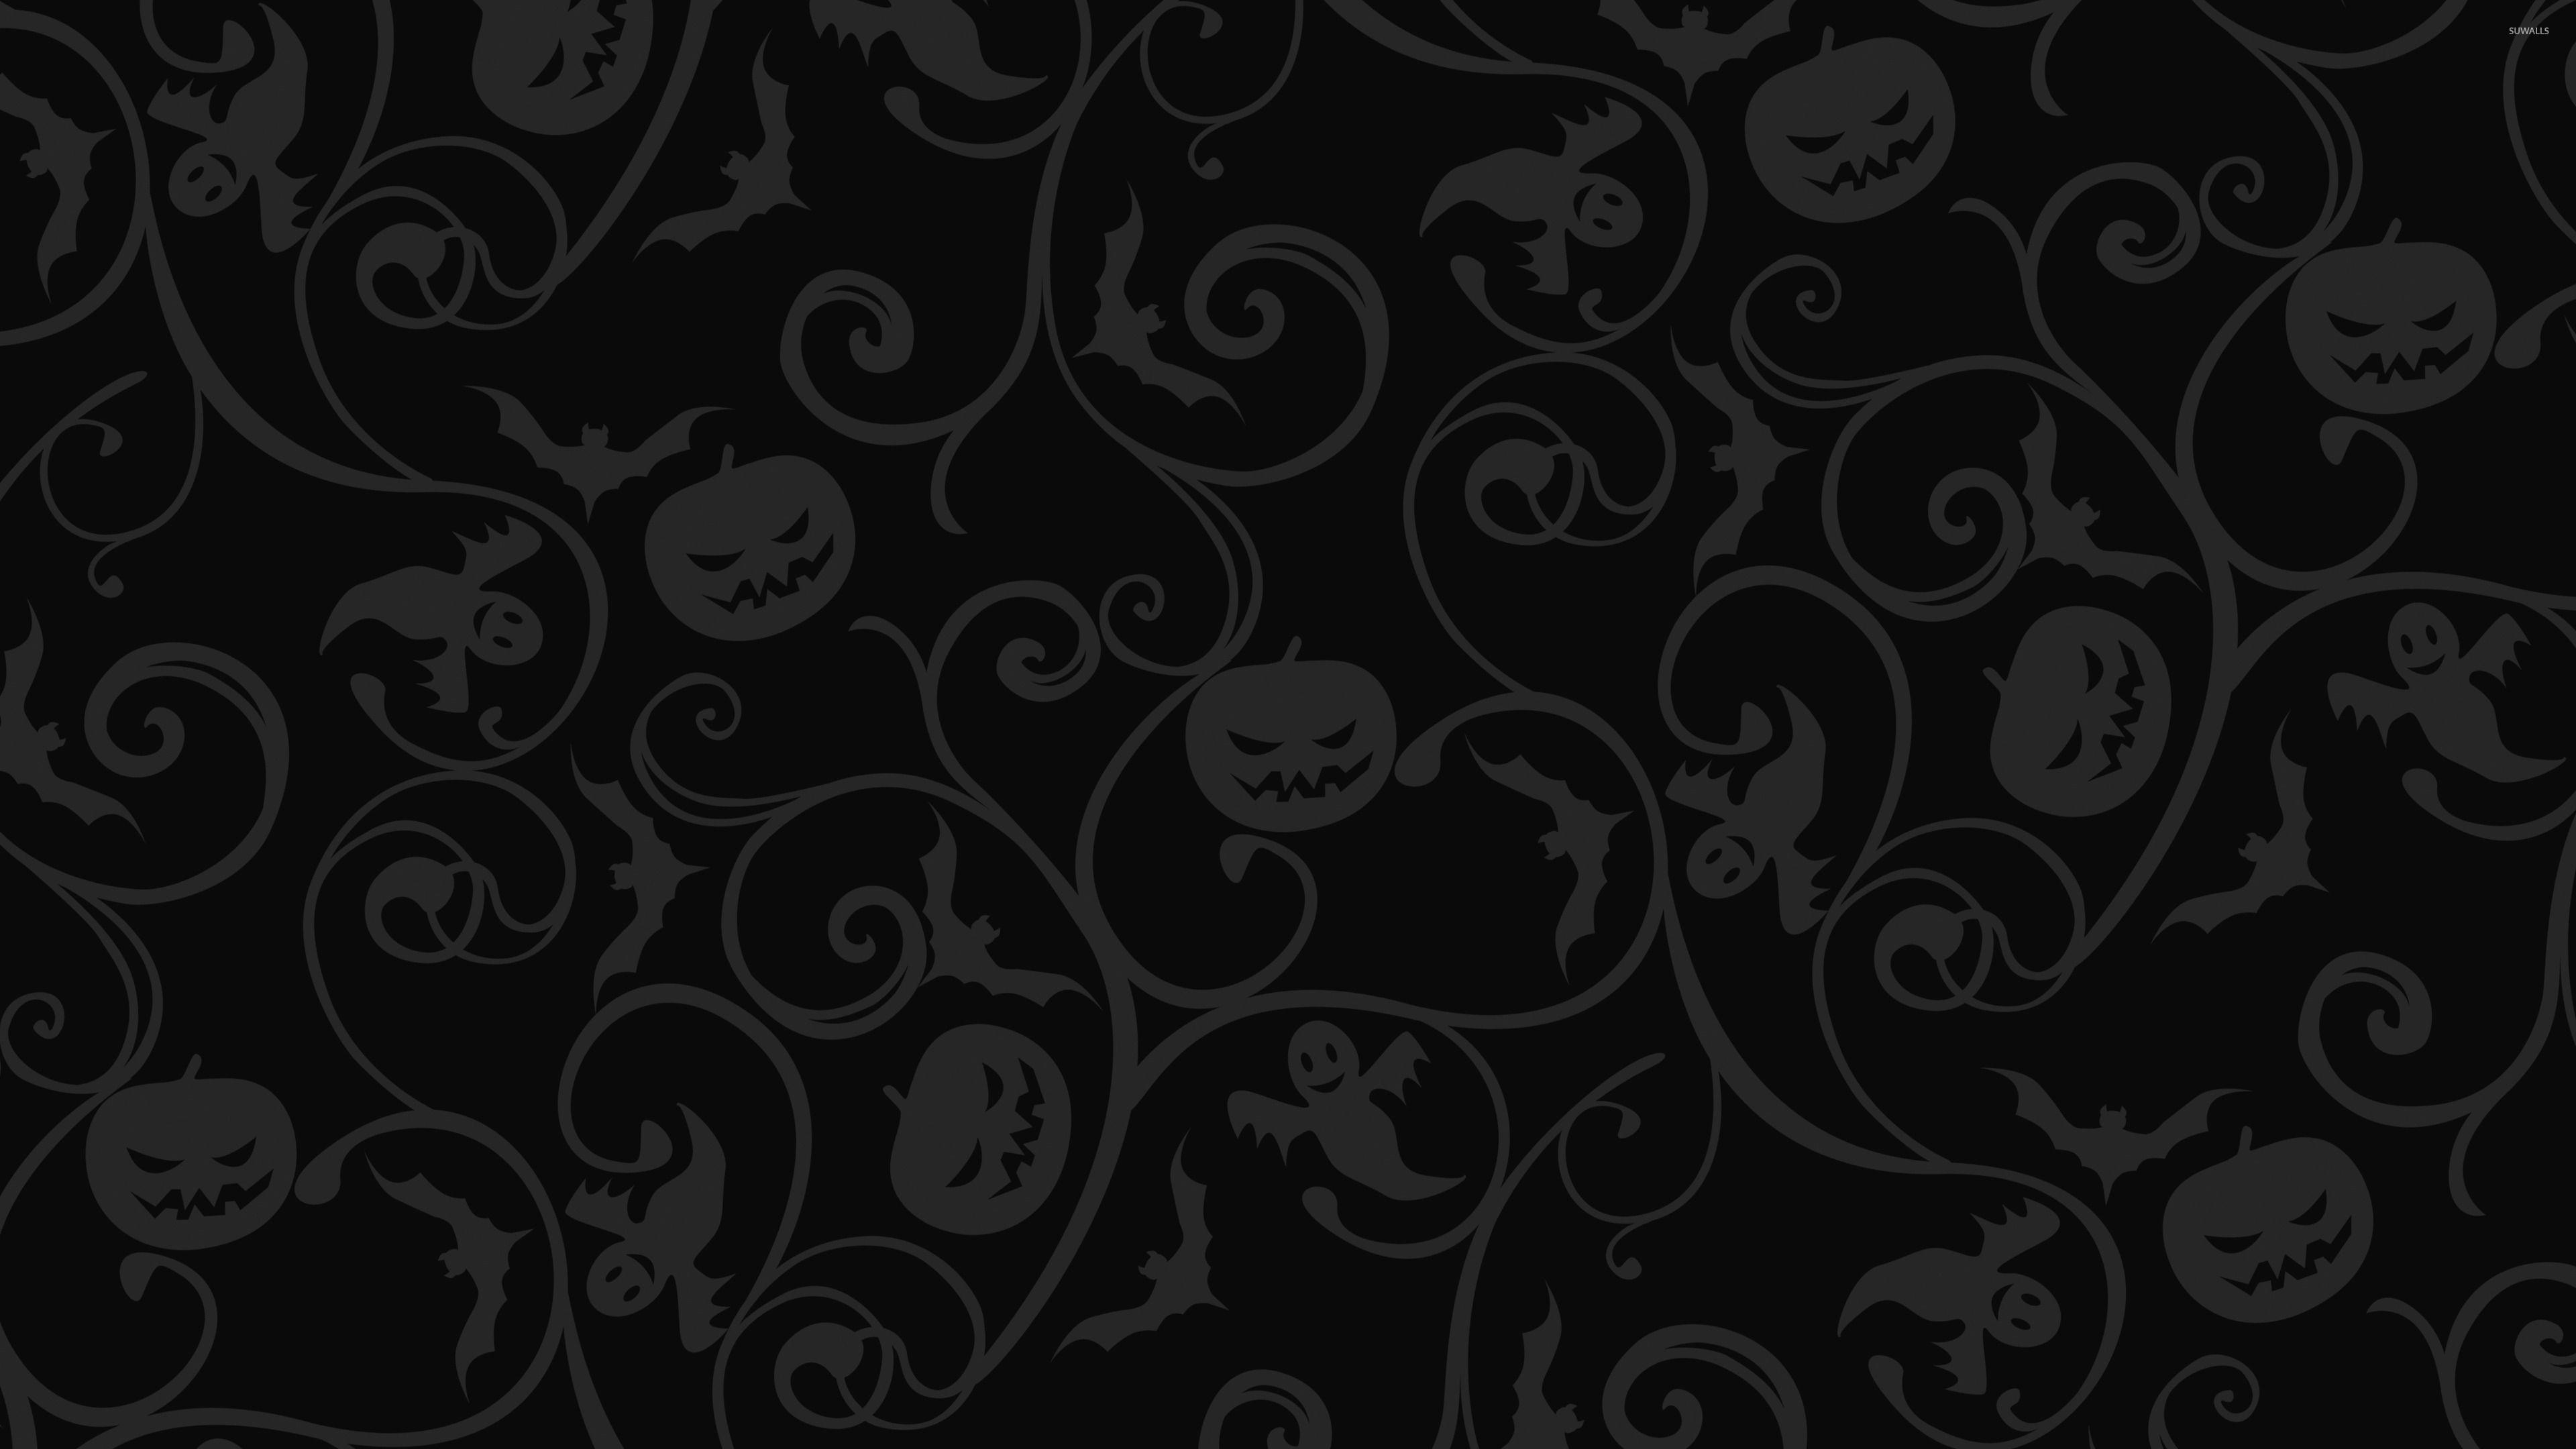 Halloween Pattern Wallpaper.Black Halloween Wallpapers Wallpaper Cave